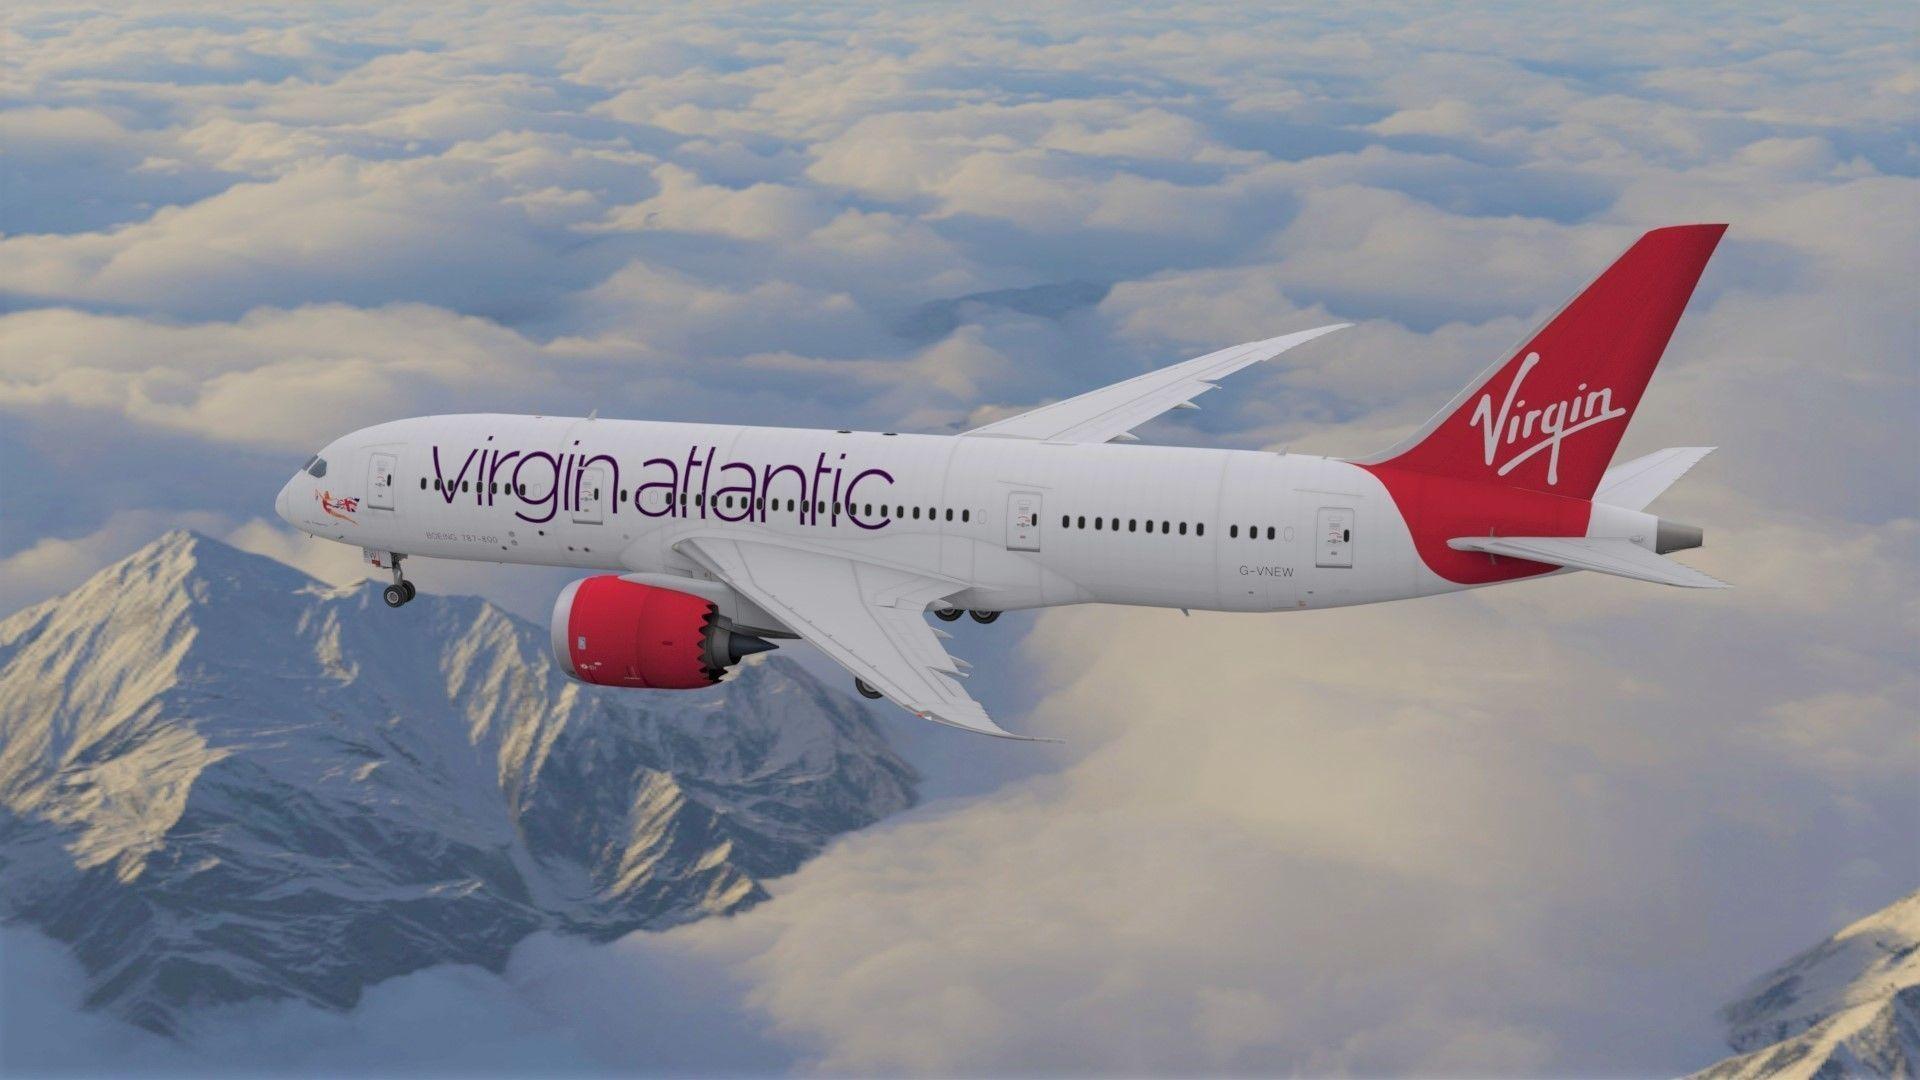 Boeing 787 Dreamliner Virgin Atlantic aircraft | 3D model